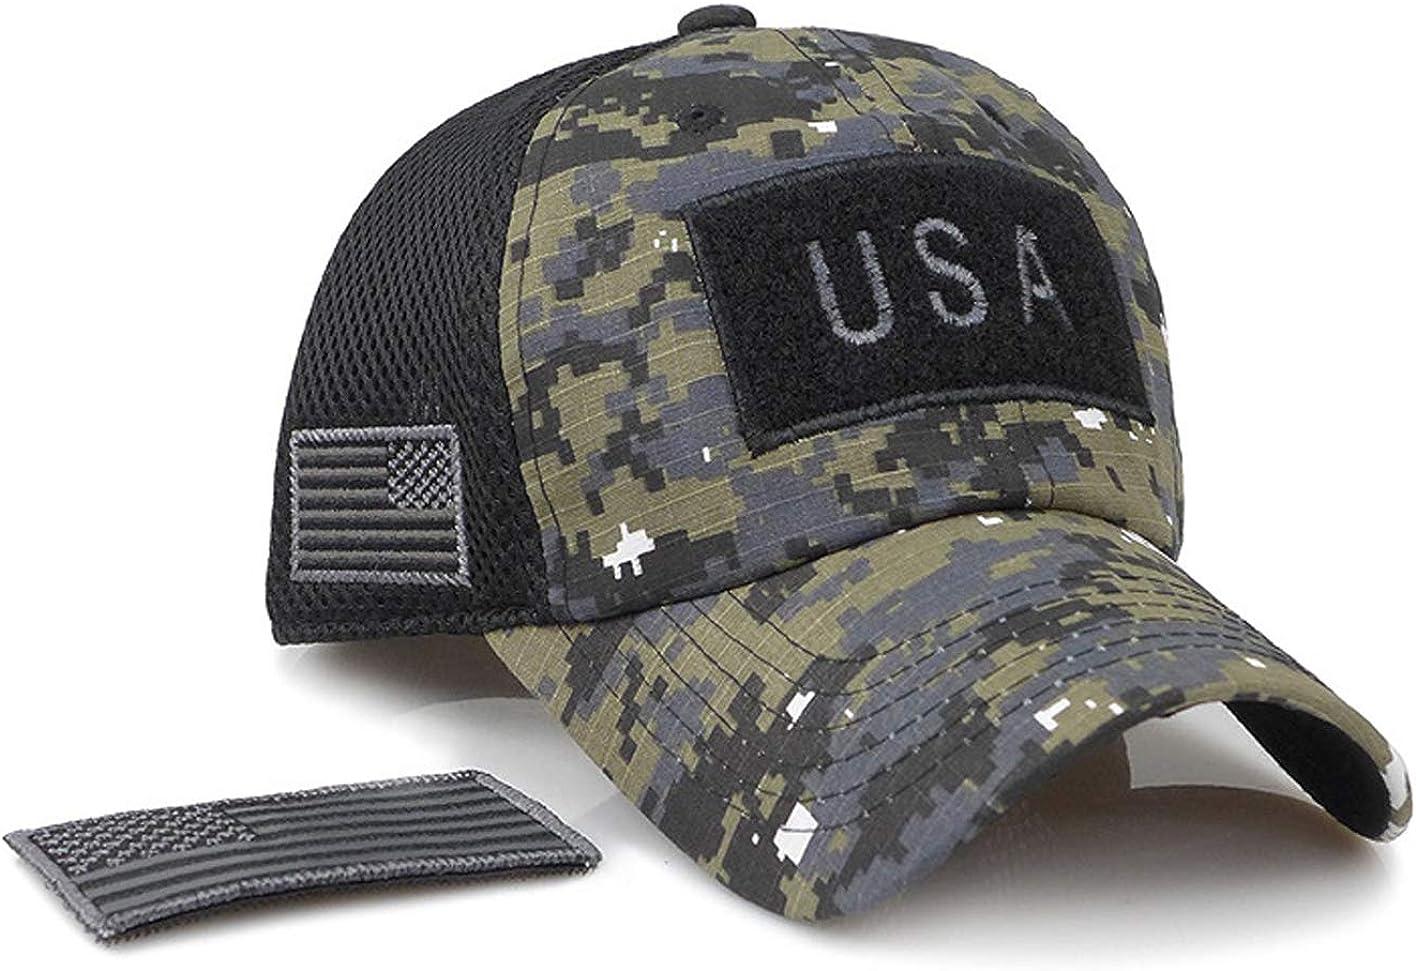 KEFITEVD Herren Tactical Cap Camo Baseball Kappe US Flagge Sonnenhut Military Cap Klettfl/äche Army Kappe Meshgewebe Safari Hut Sommerhut Outdoor #BQM